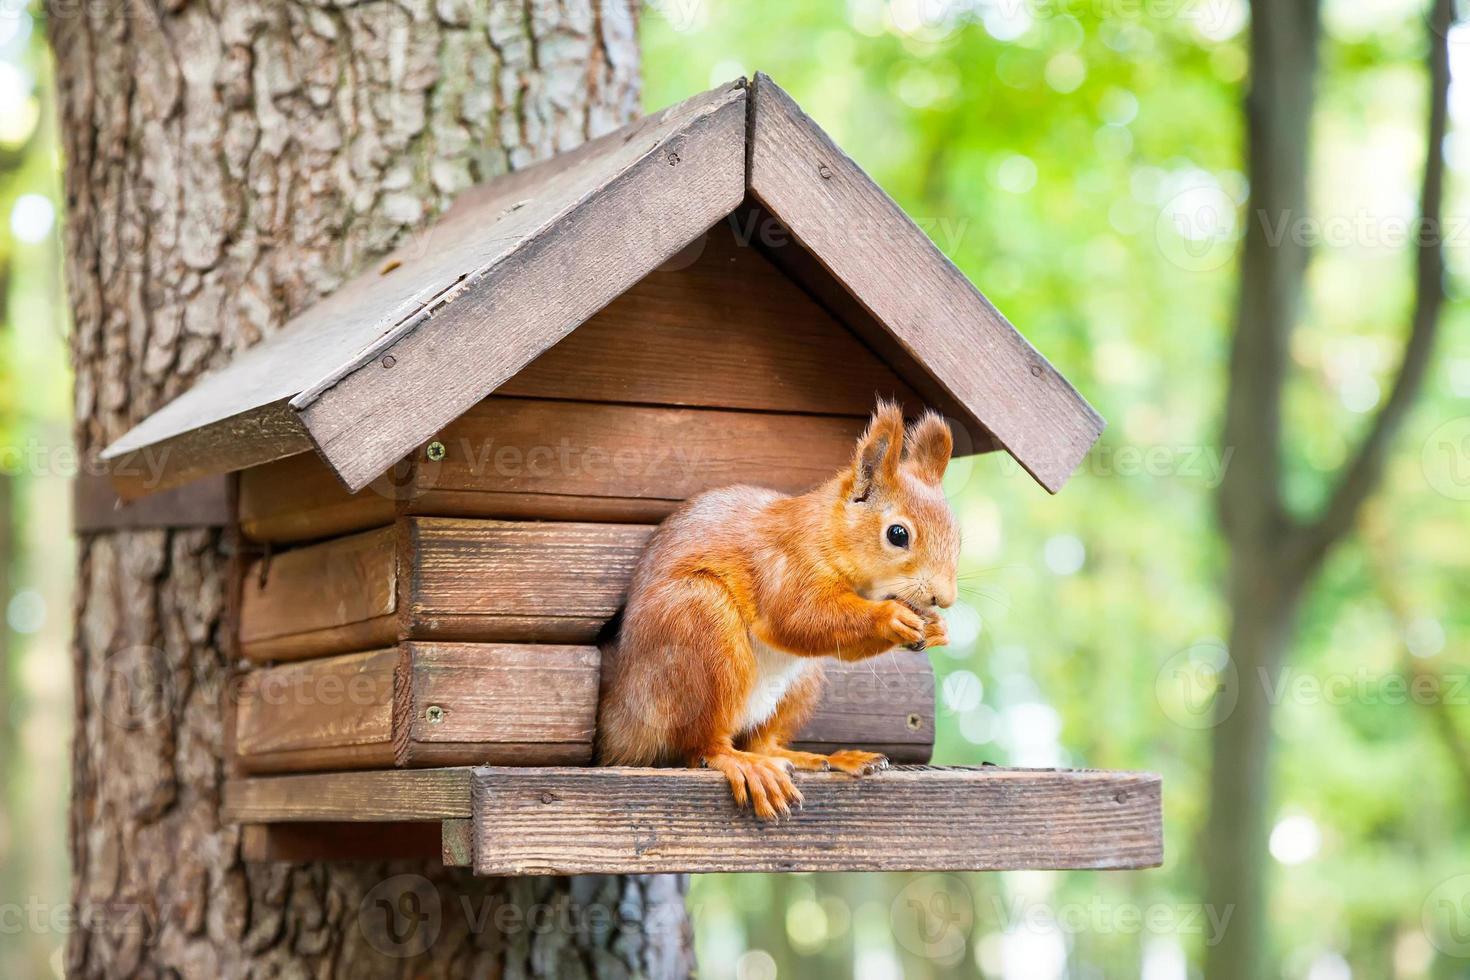 vild ekorre äter i sitt hus foto